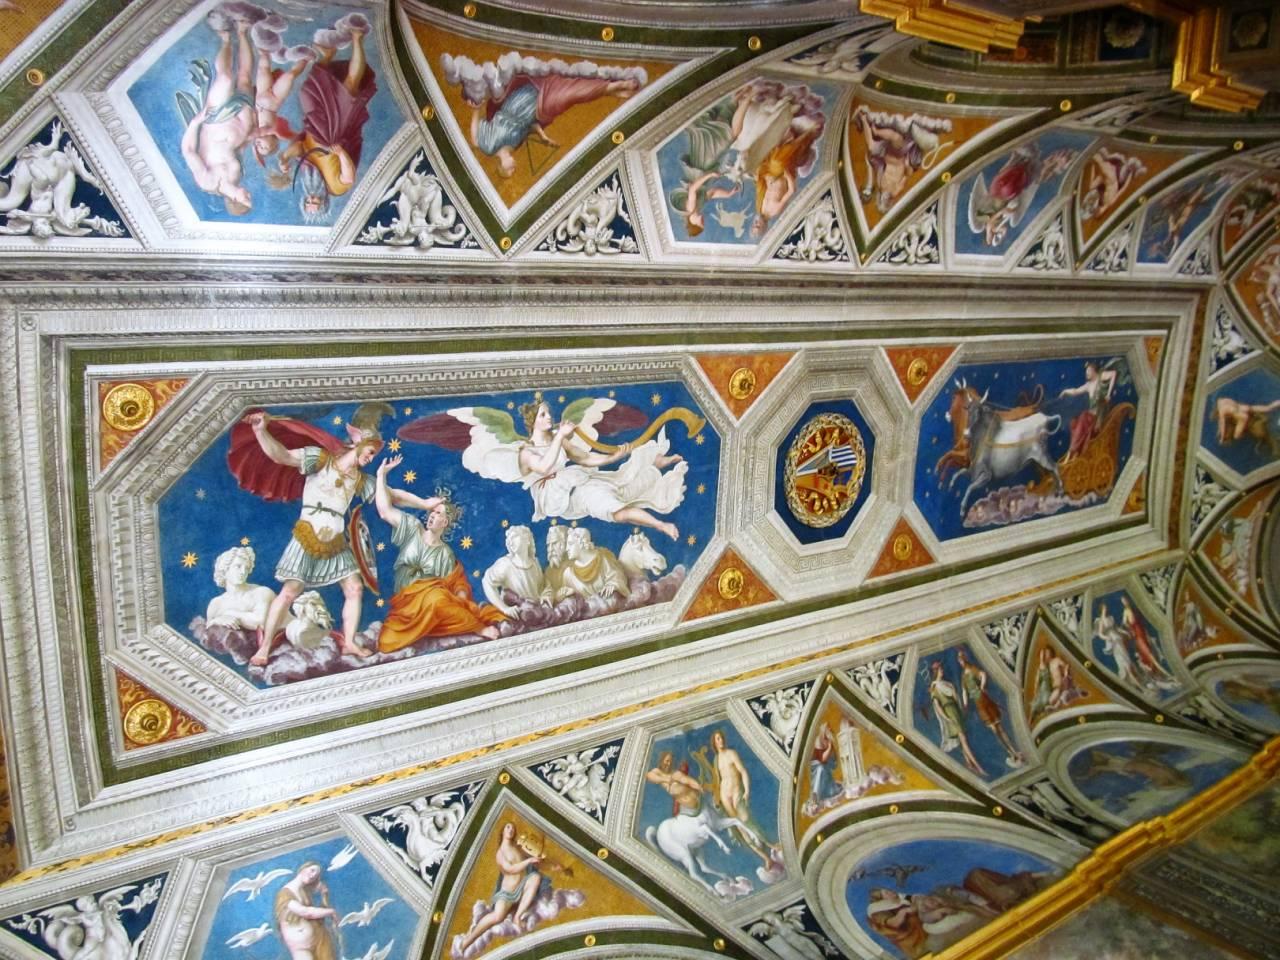 Сувенир из отпуска: гороскоп на потолке